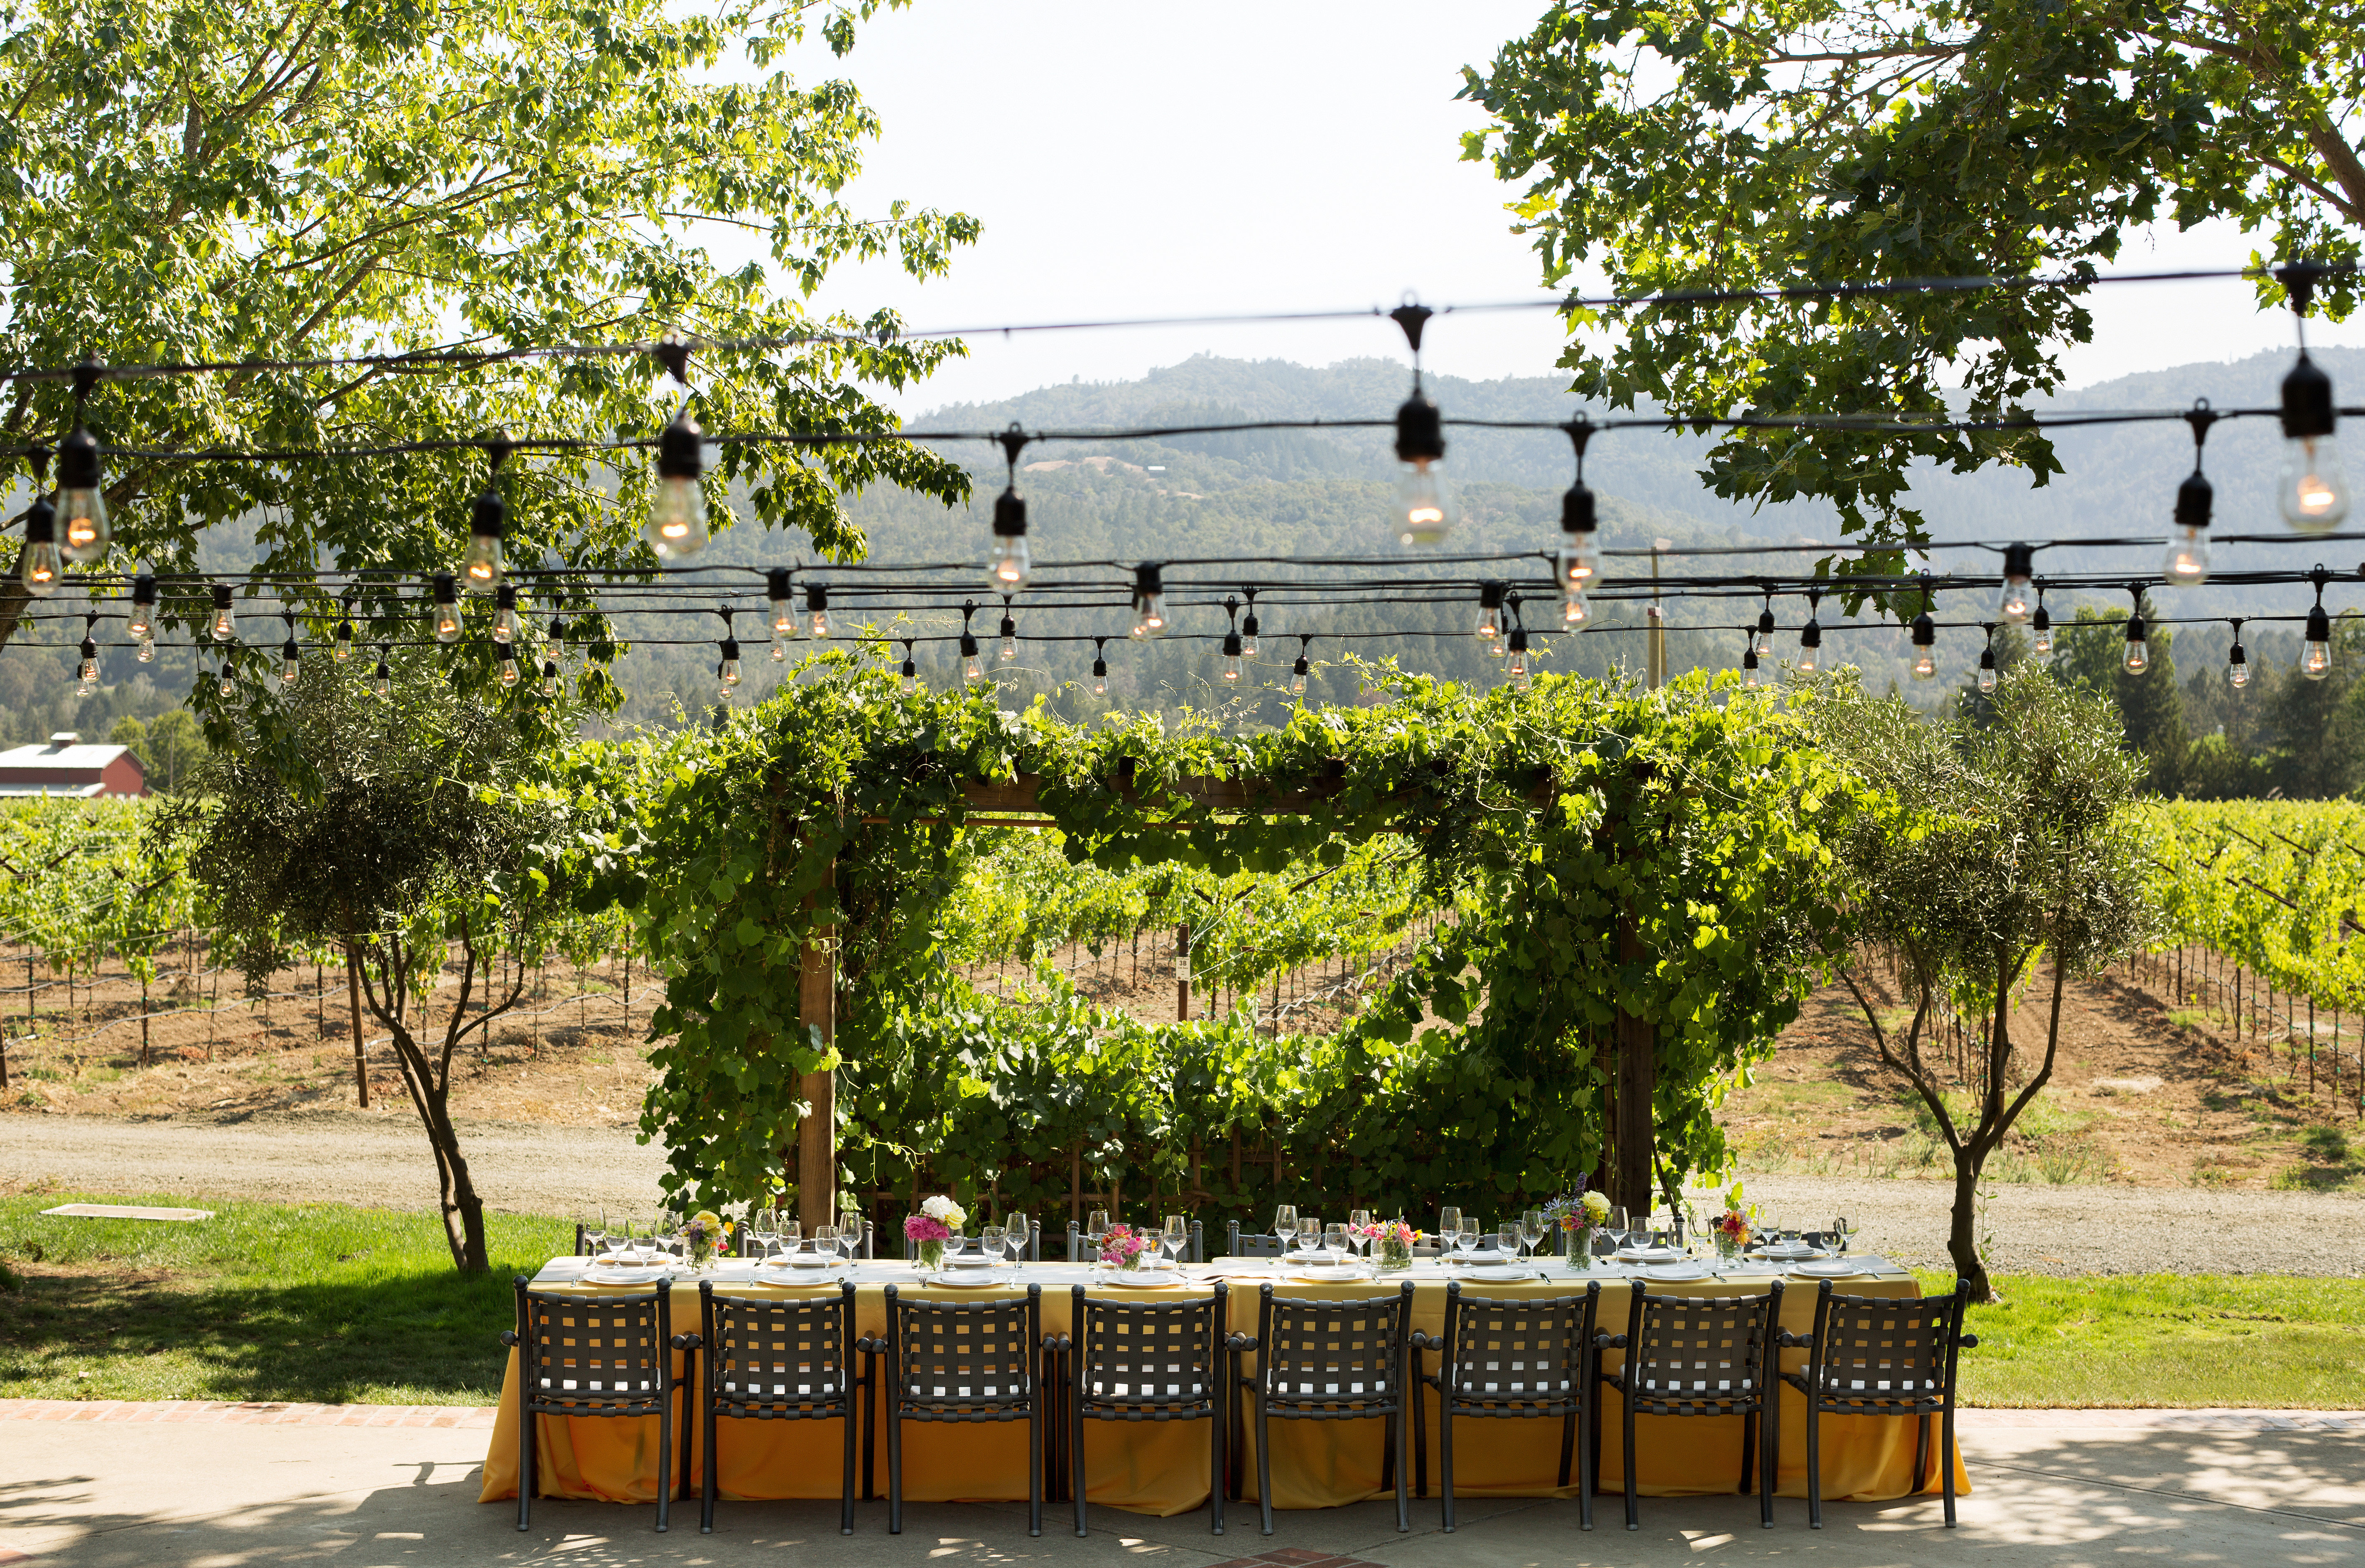 Drink Eat Nature Outdoors Romantic Vineyard Wine-Tasting tree botany plant flower park Garden